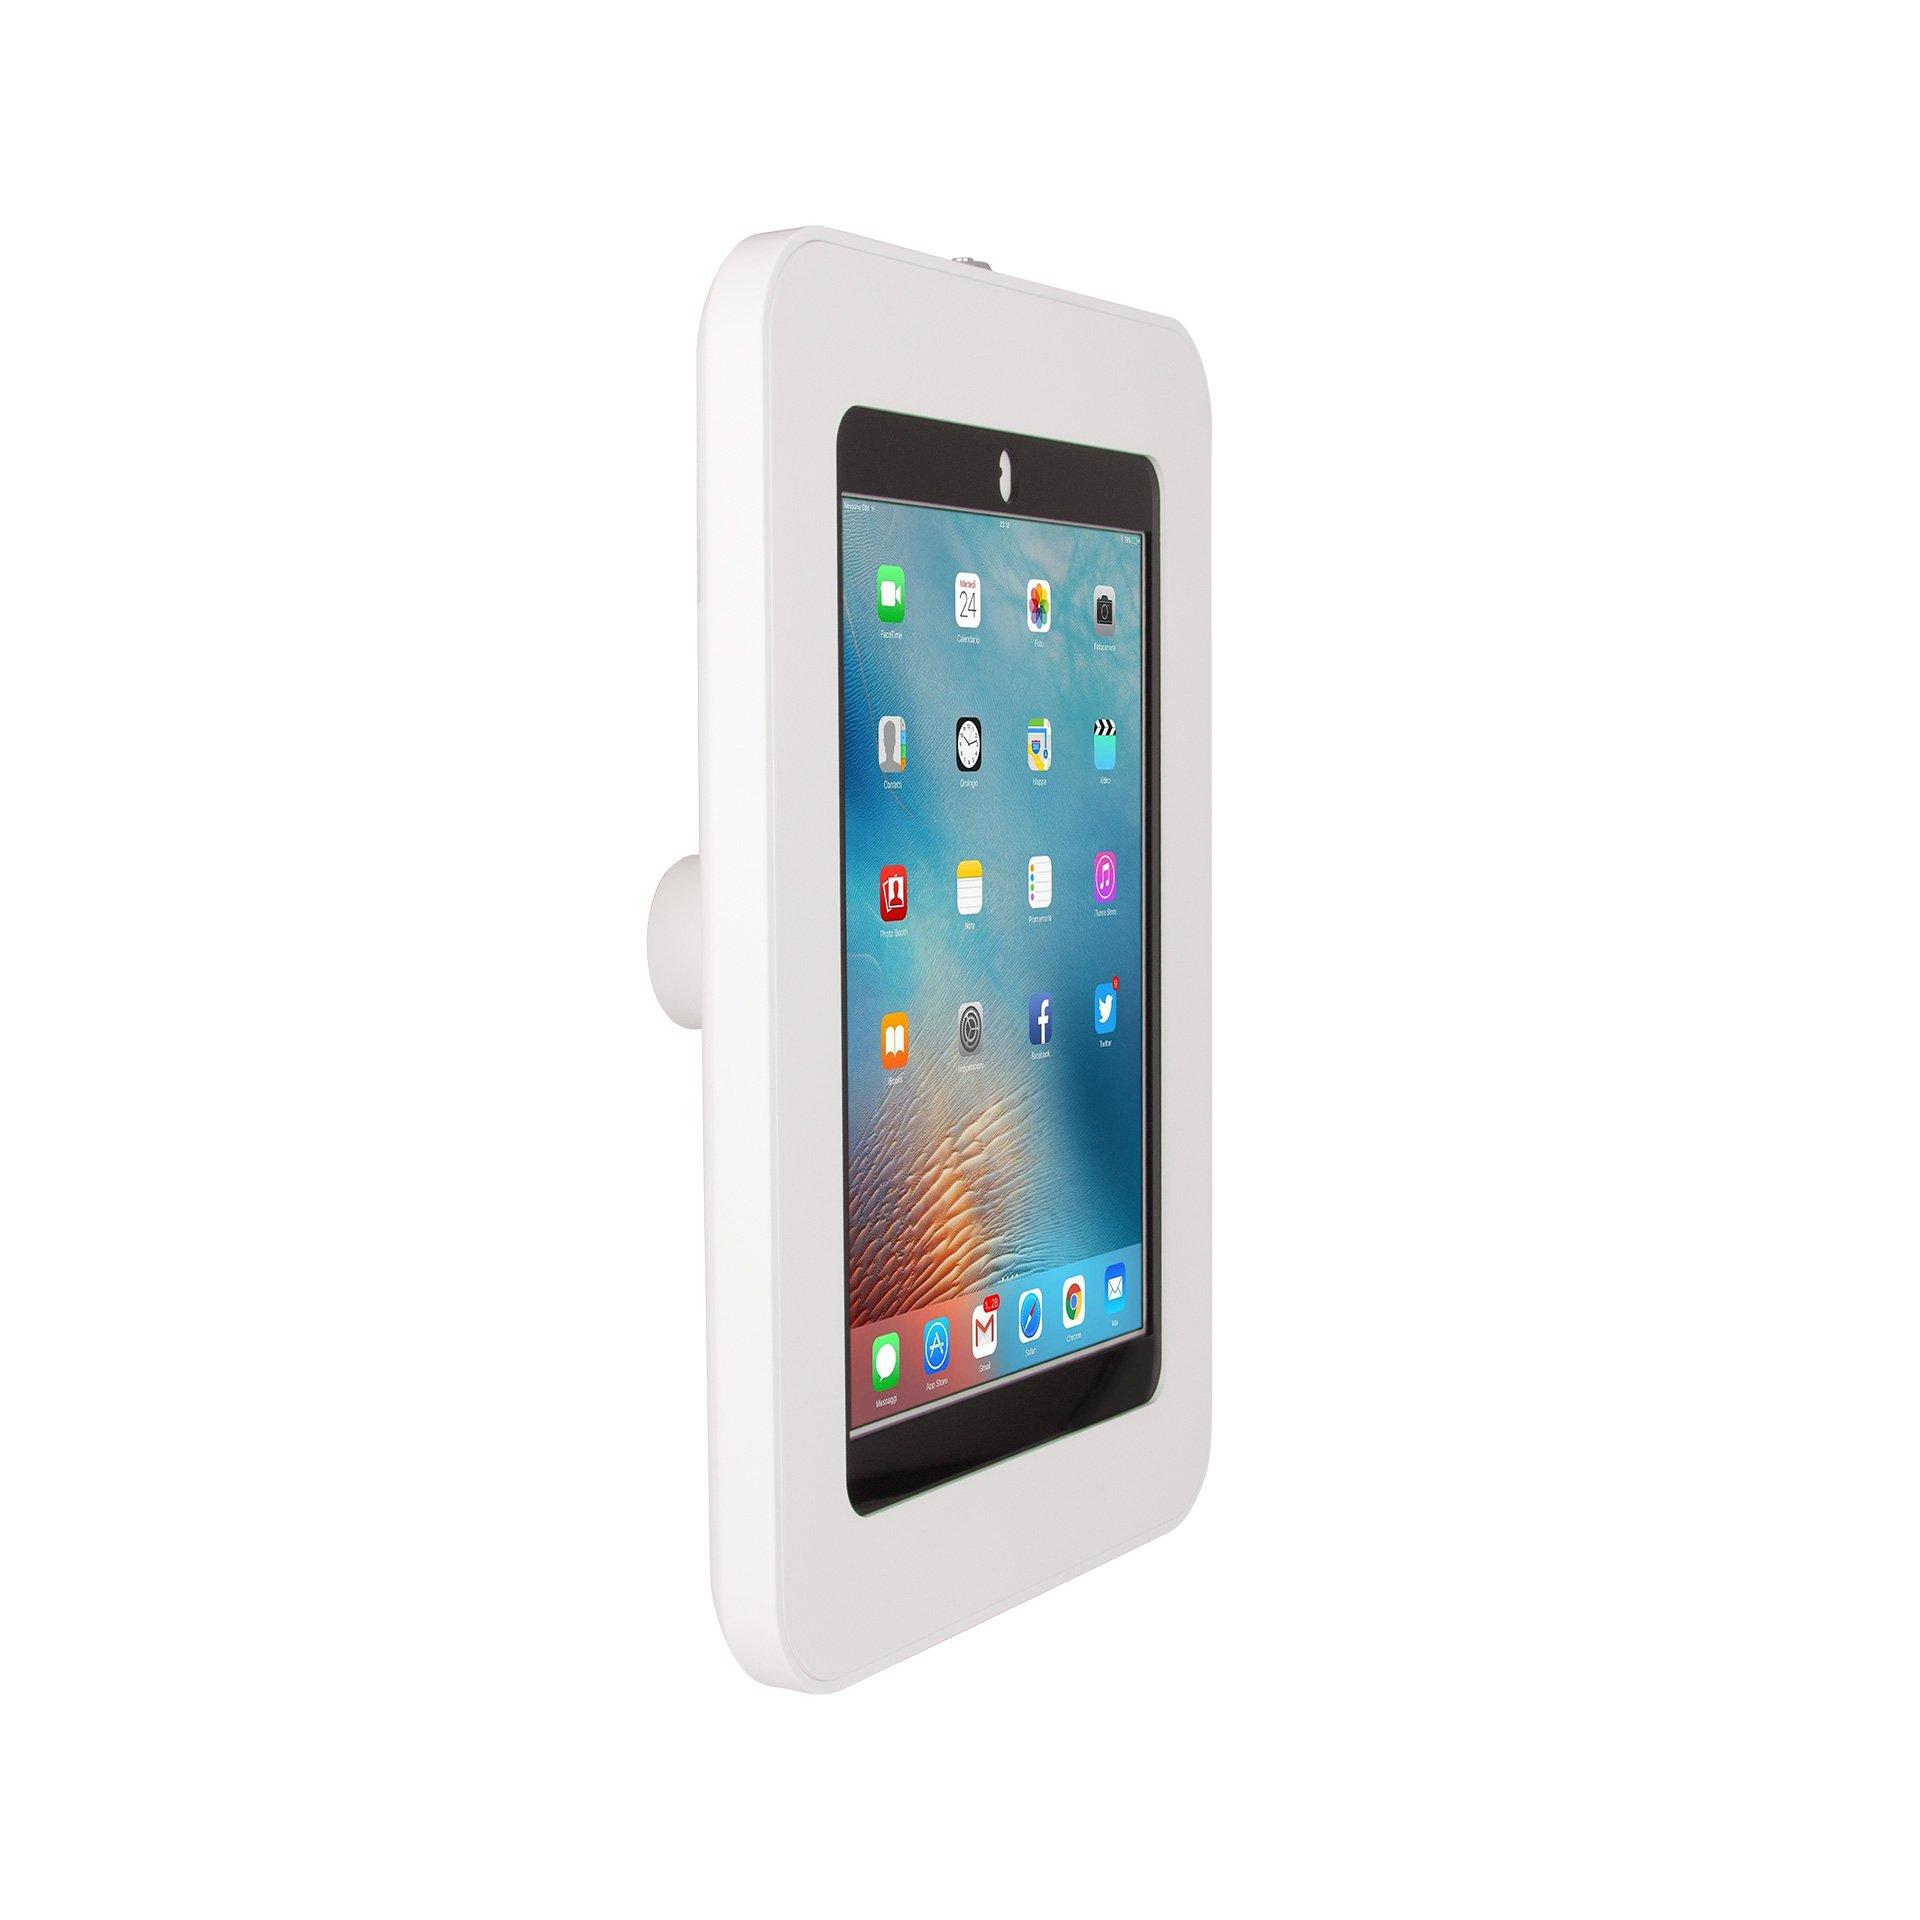 "The Joy Factory Elevate II On-Wall Retail Kiosk for iPad Pro 10.5"" (KAA604W)"